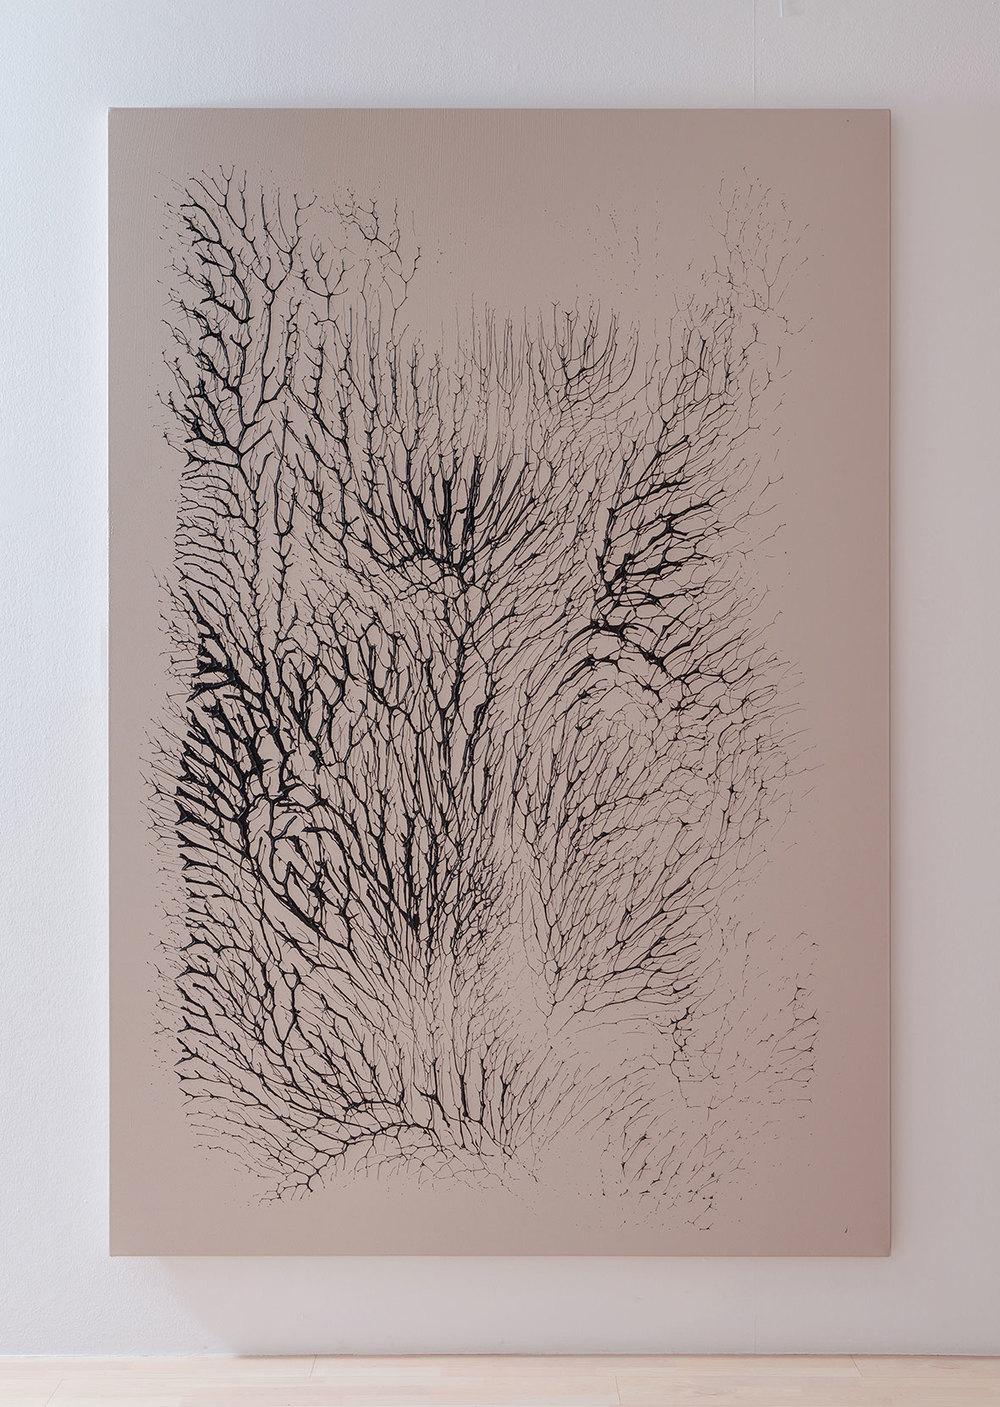 ROCA2012 Monotypes. Acrylic on canvas. 174cm x 256cm. (6´x8´).